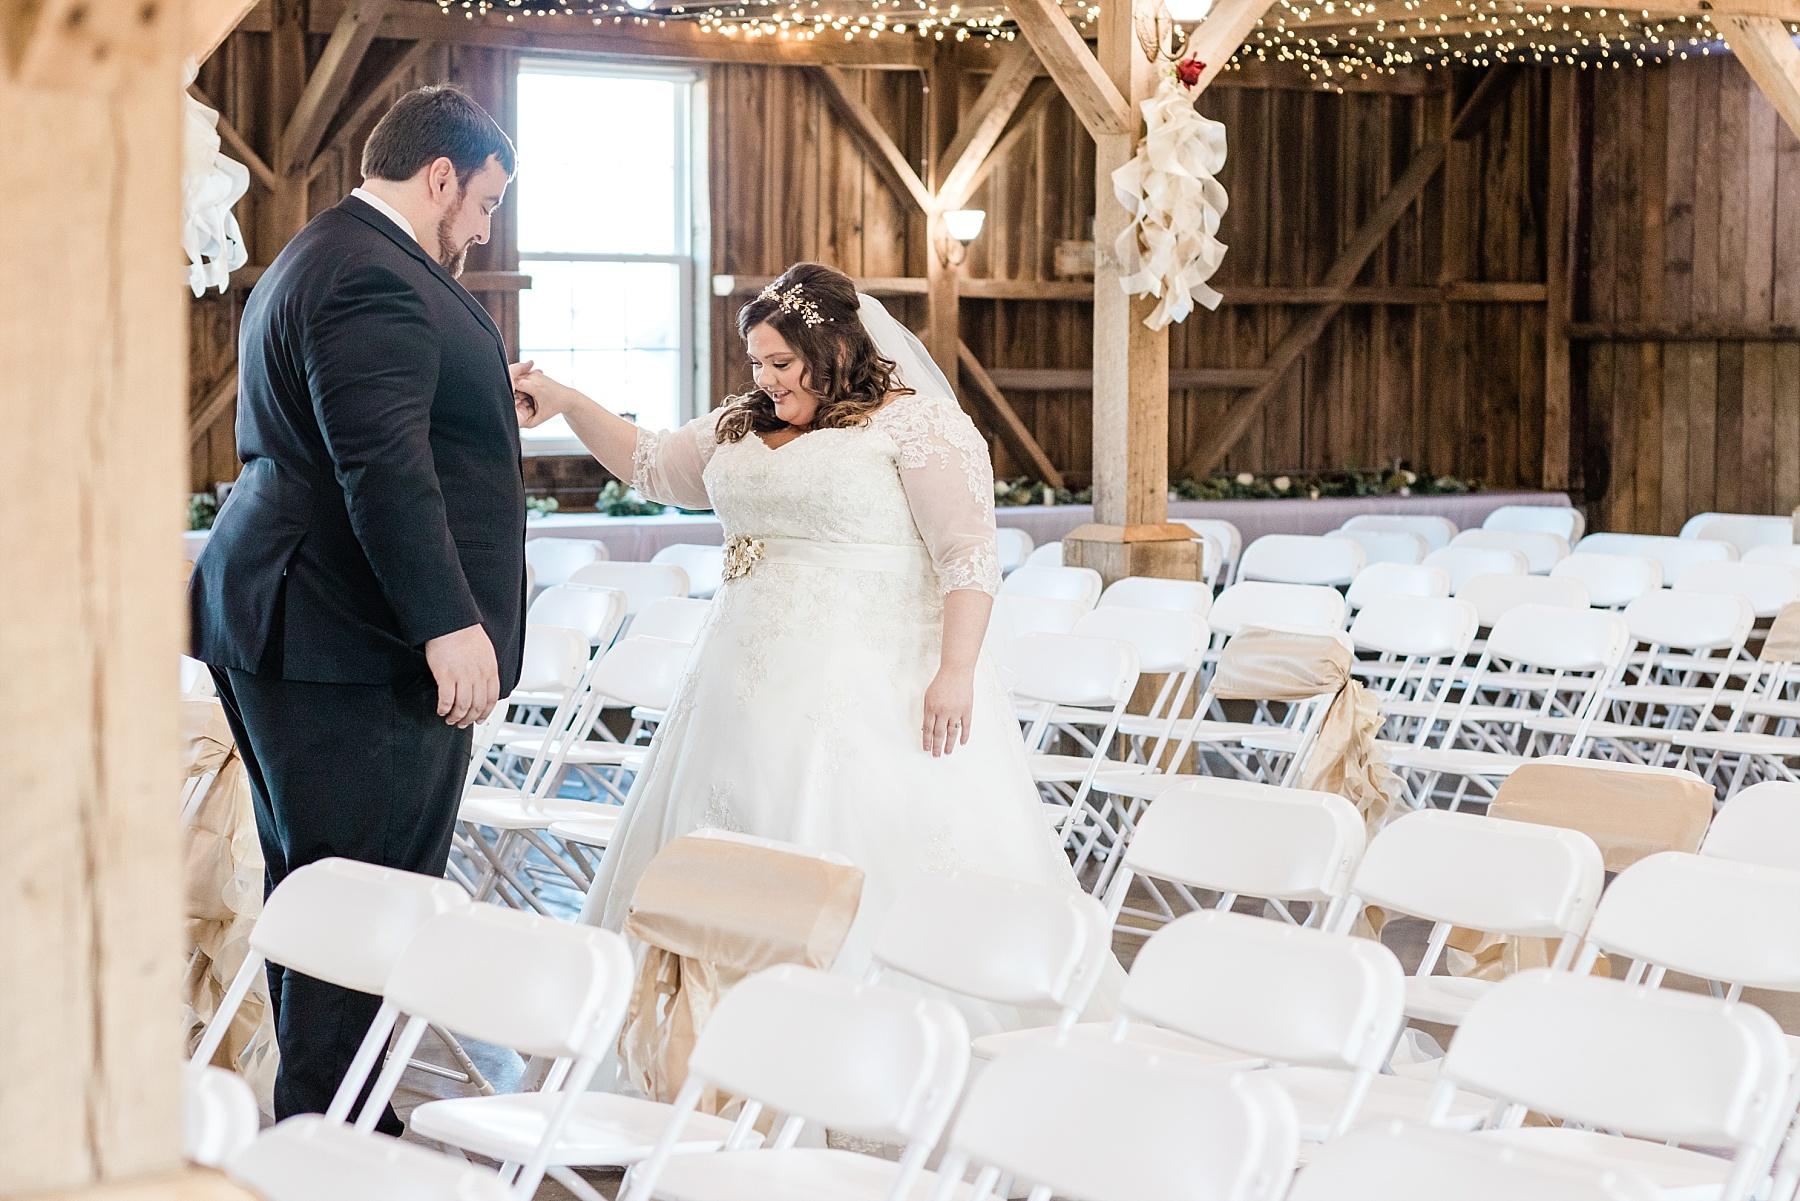 Golden Winter Wedding at The Legacy Barn in Barnett Missouri by Kelsi Kliethermes Photography Columbia Missouri Wedding Photographer_0002.jpg